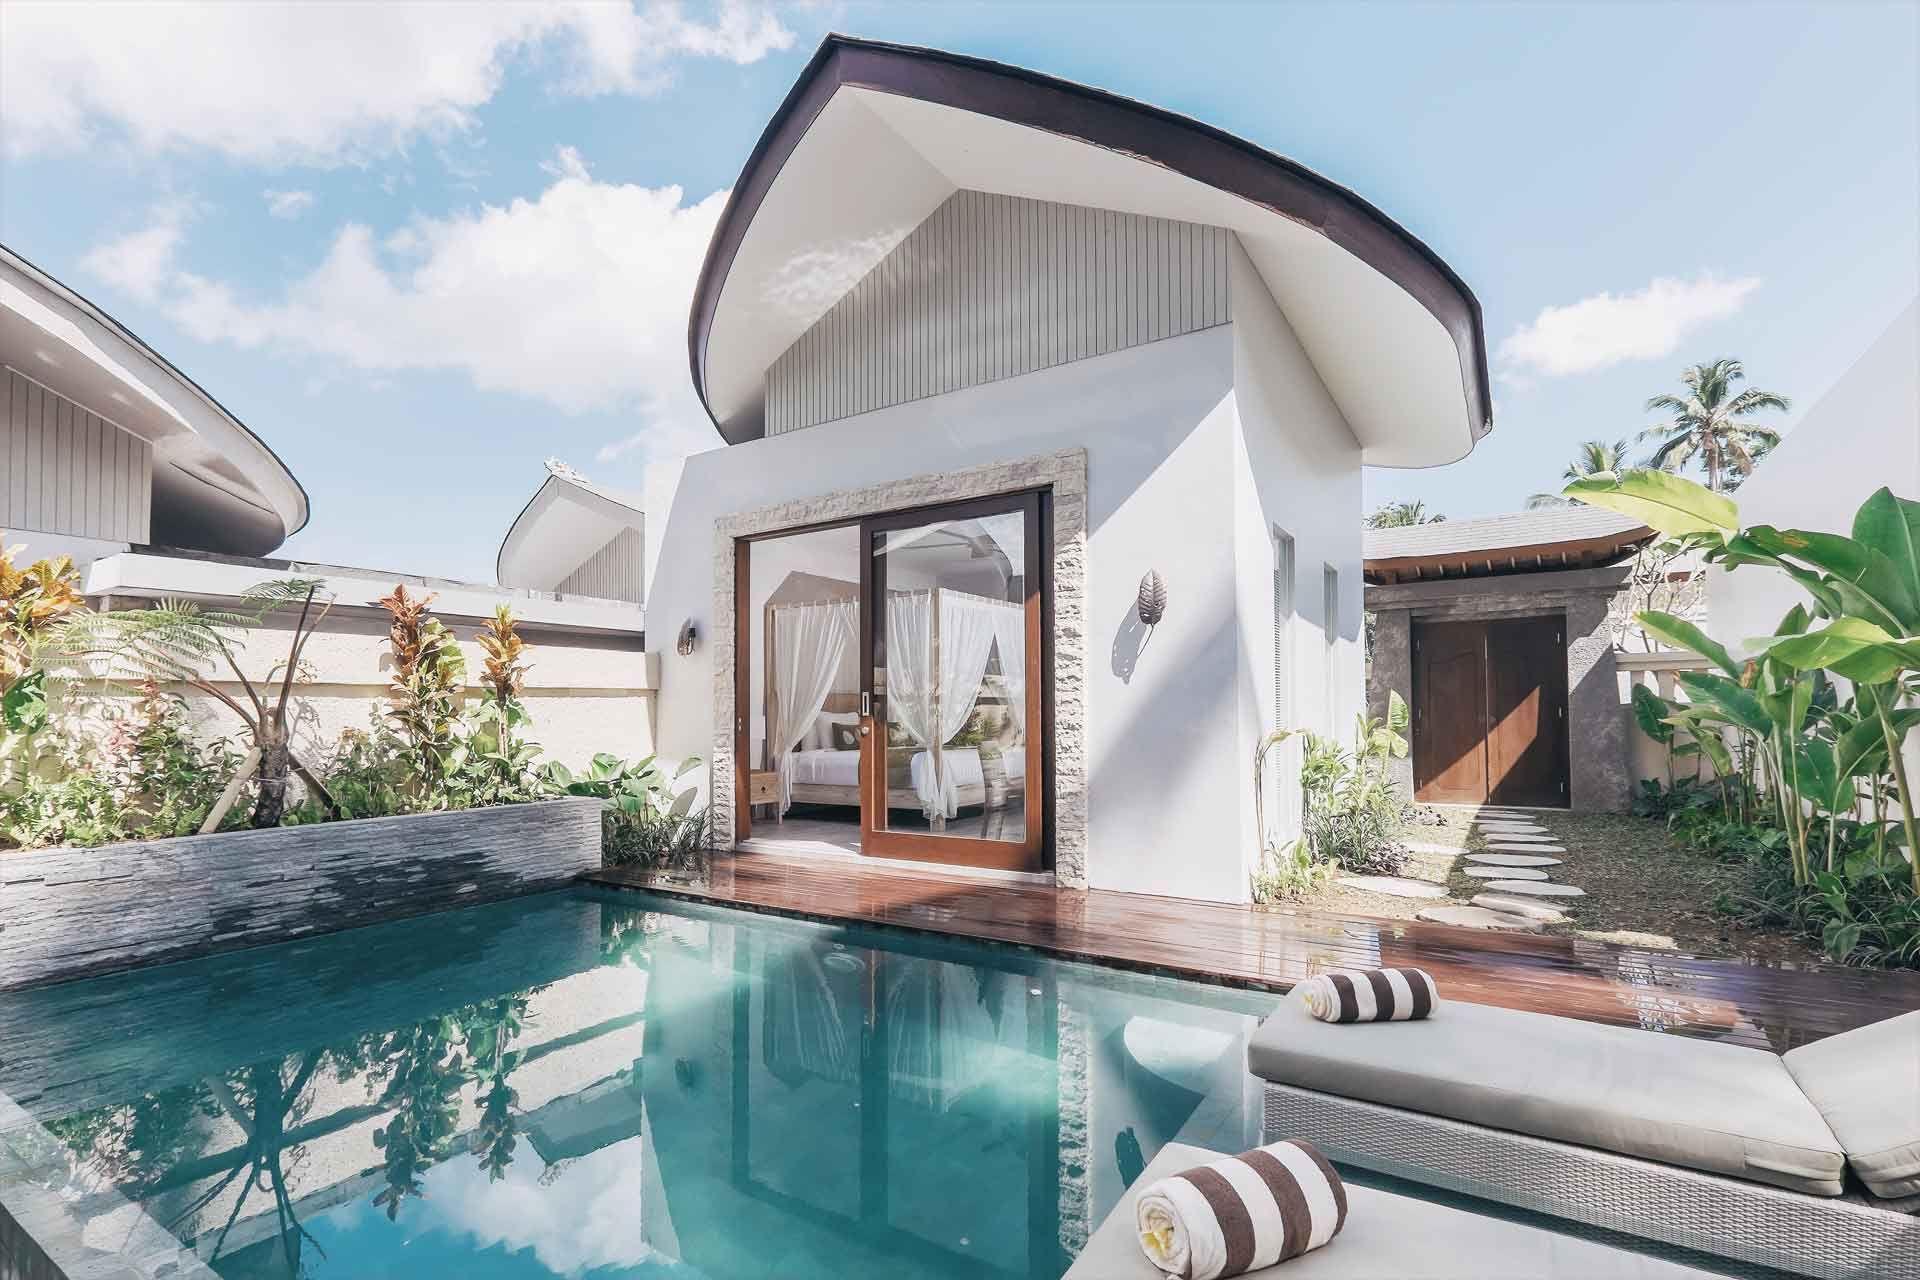 Daun Lebar Villas Ubud One Bedroom Pool Villa Resort Villa Ubud Hotels Bali Hotels